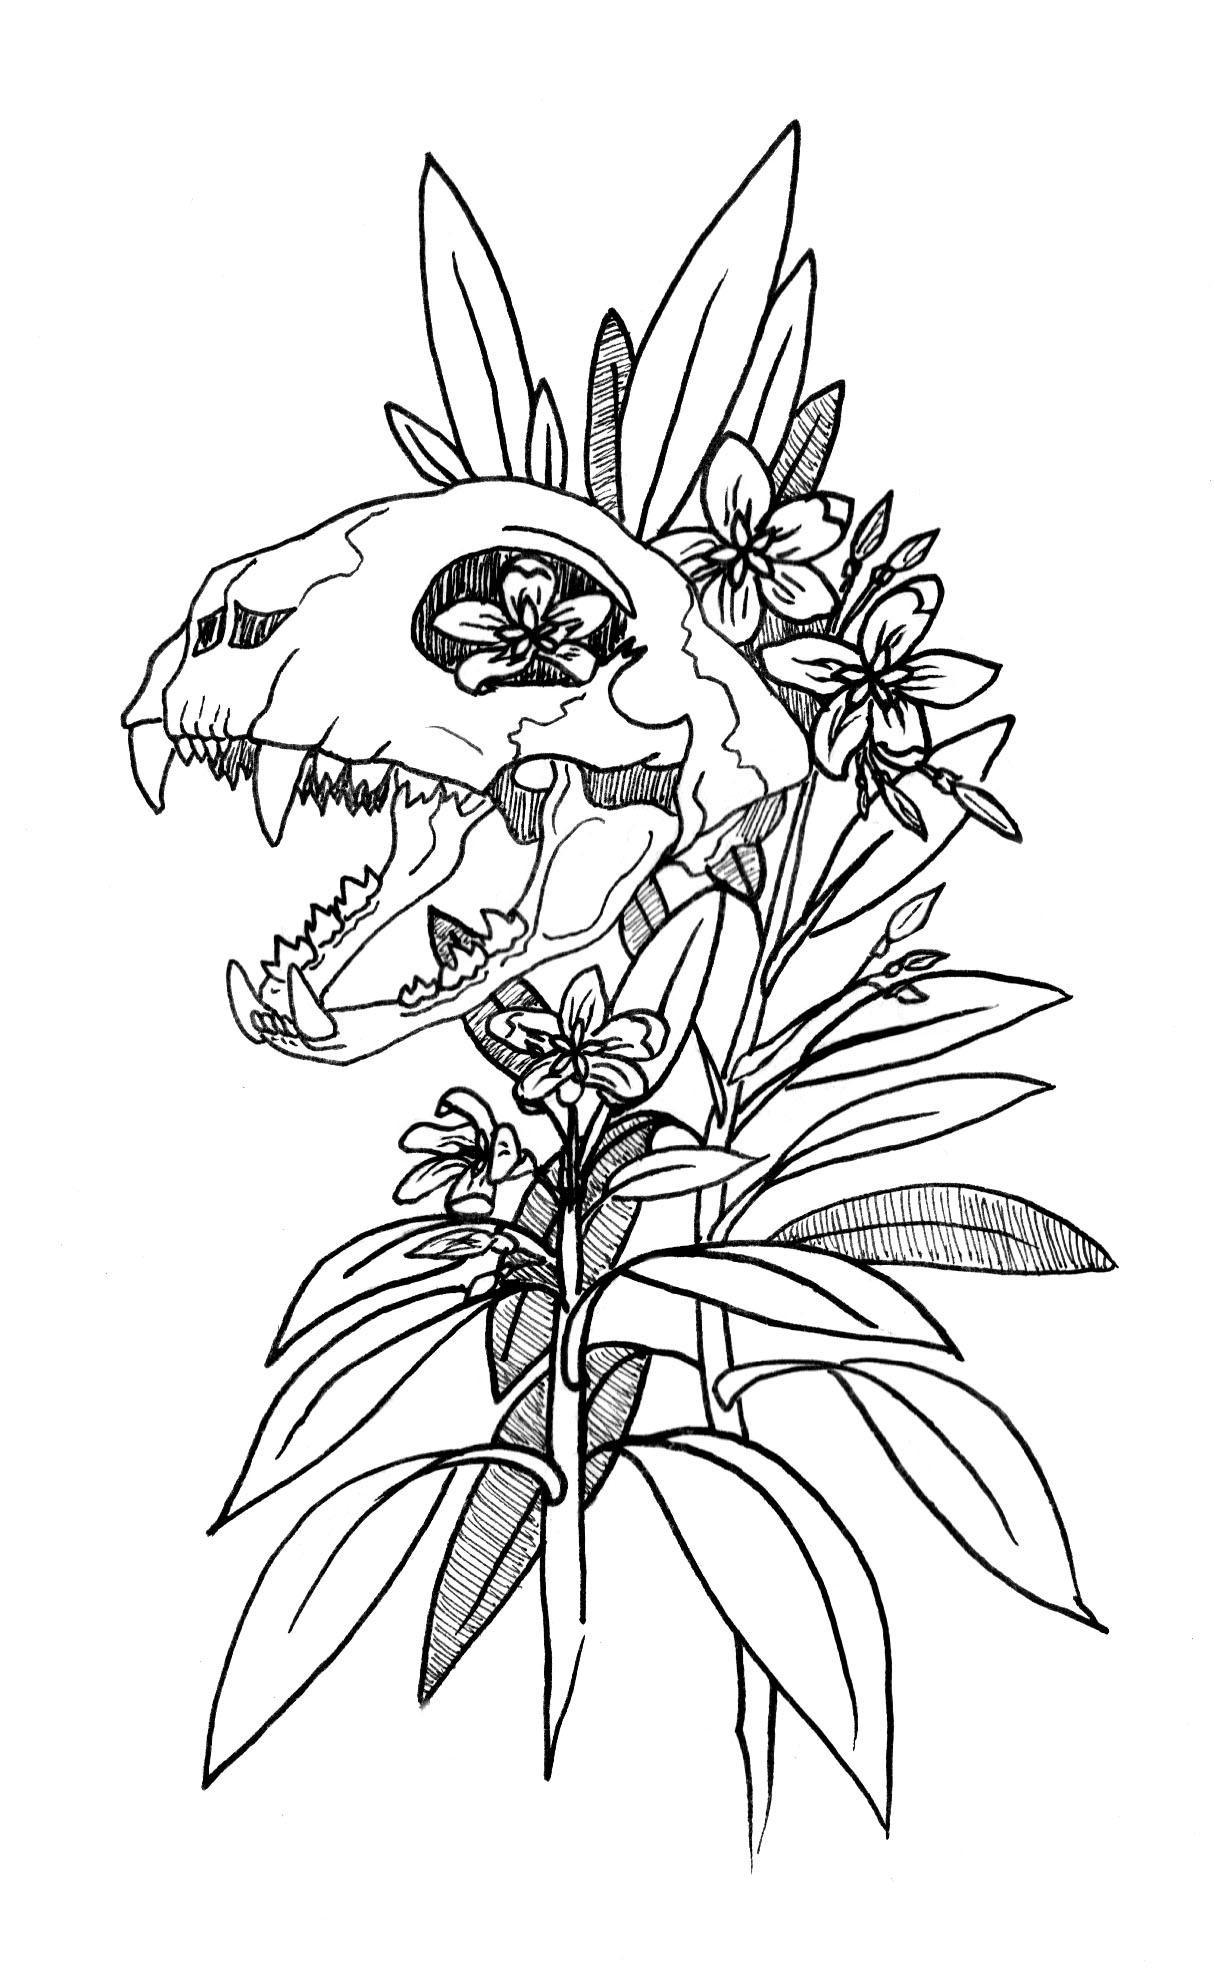 Oleander Feline, 2016   Pen